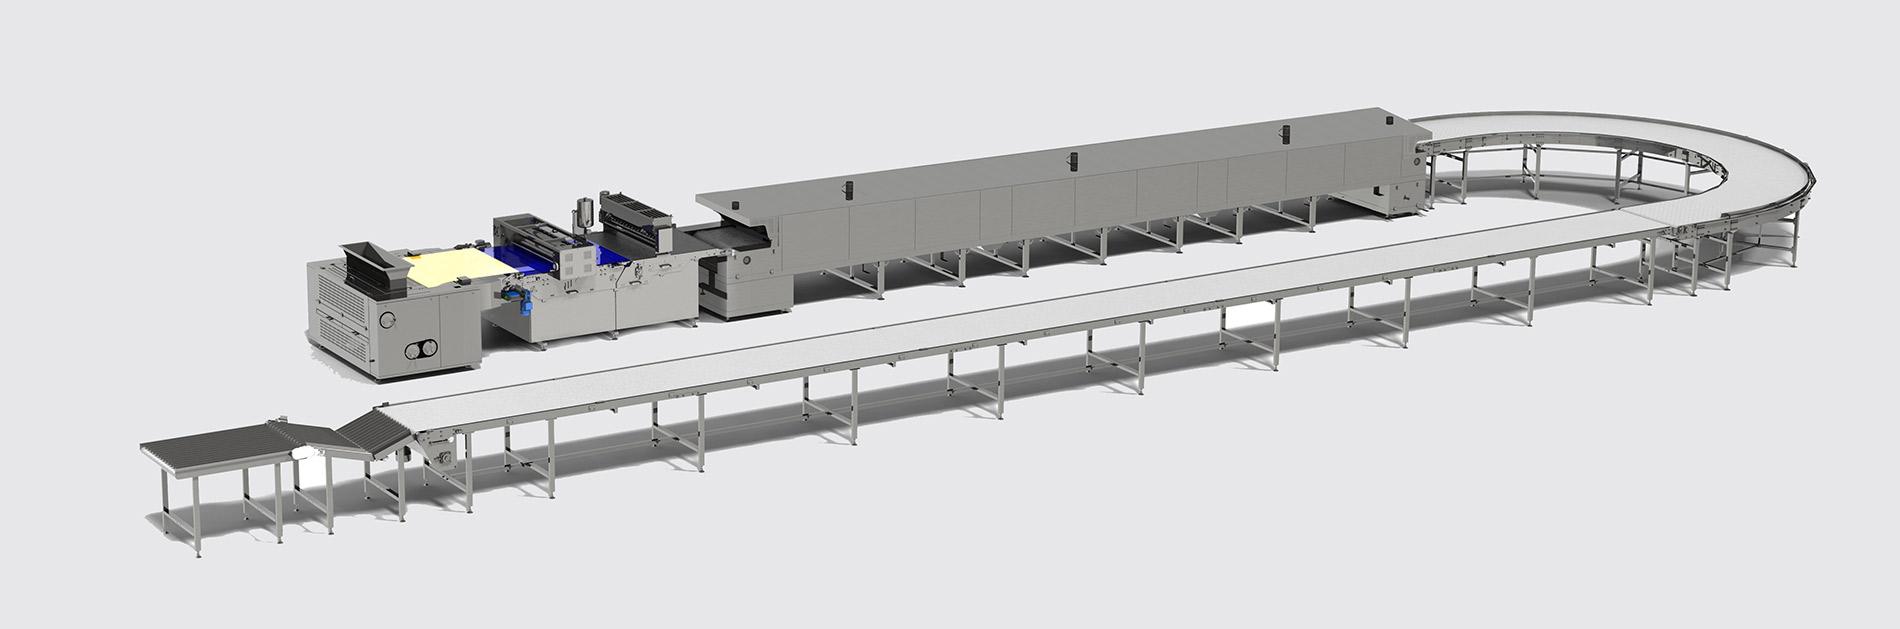 خط أوتوماتيكي لإنتاج بسكويت الناعم  Soft biscuit production line - foto №3